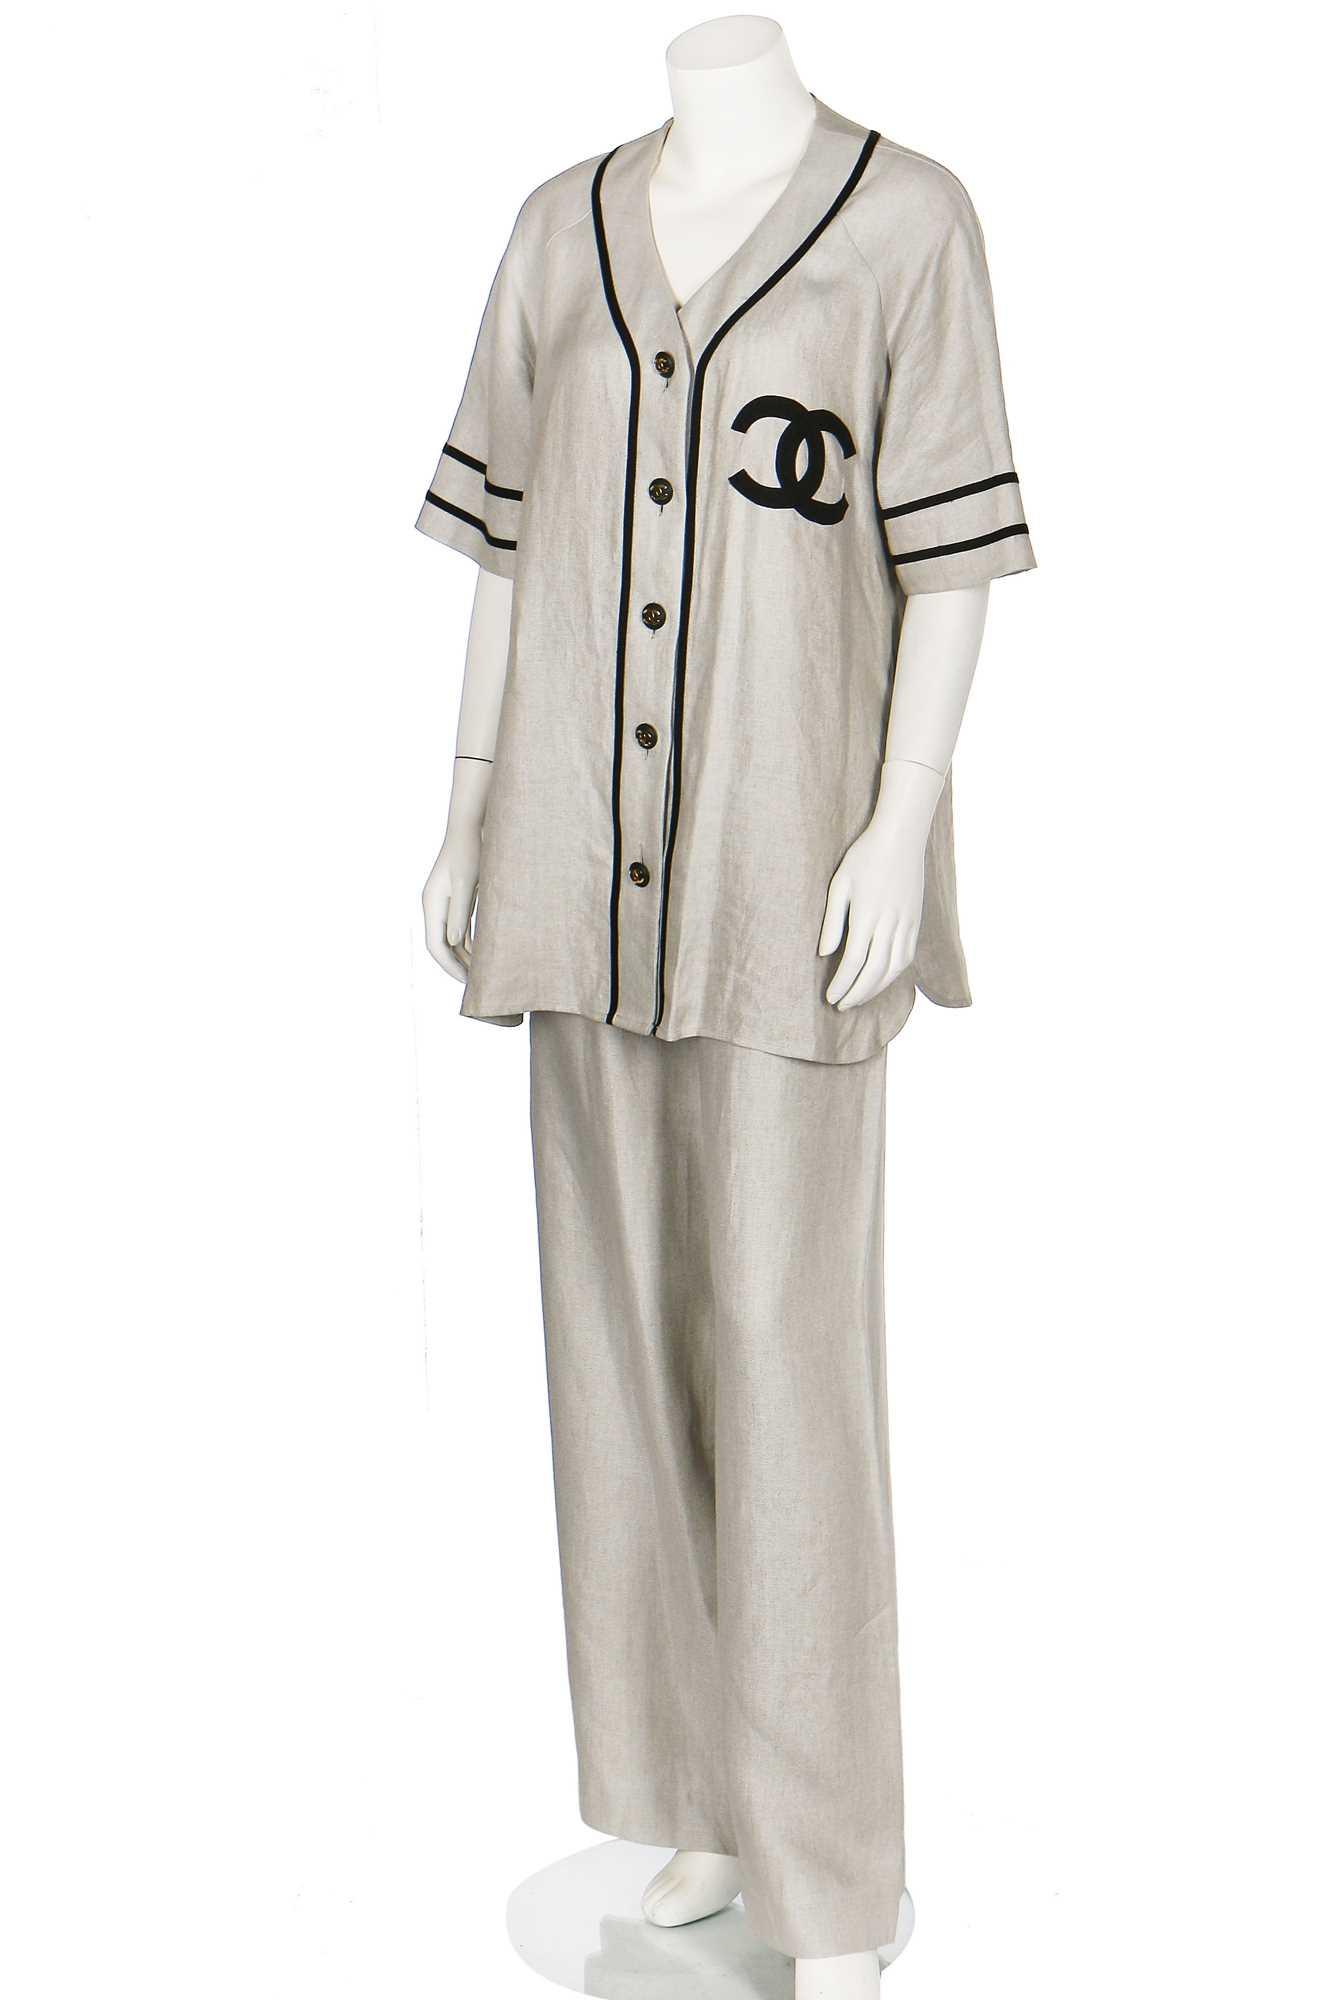 Lot 18-A Chanel by Karl Lagerfeld linen baseball-style ensemble, probably 1984